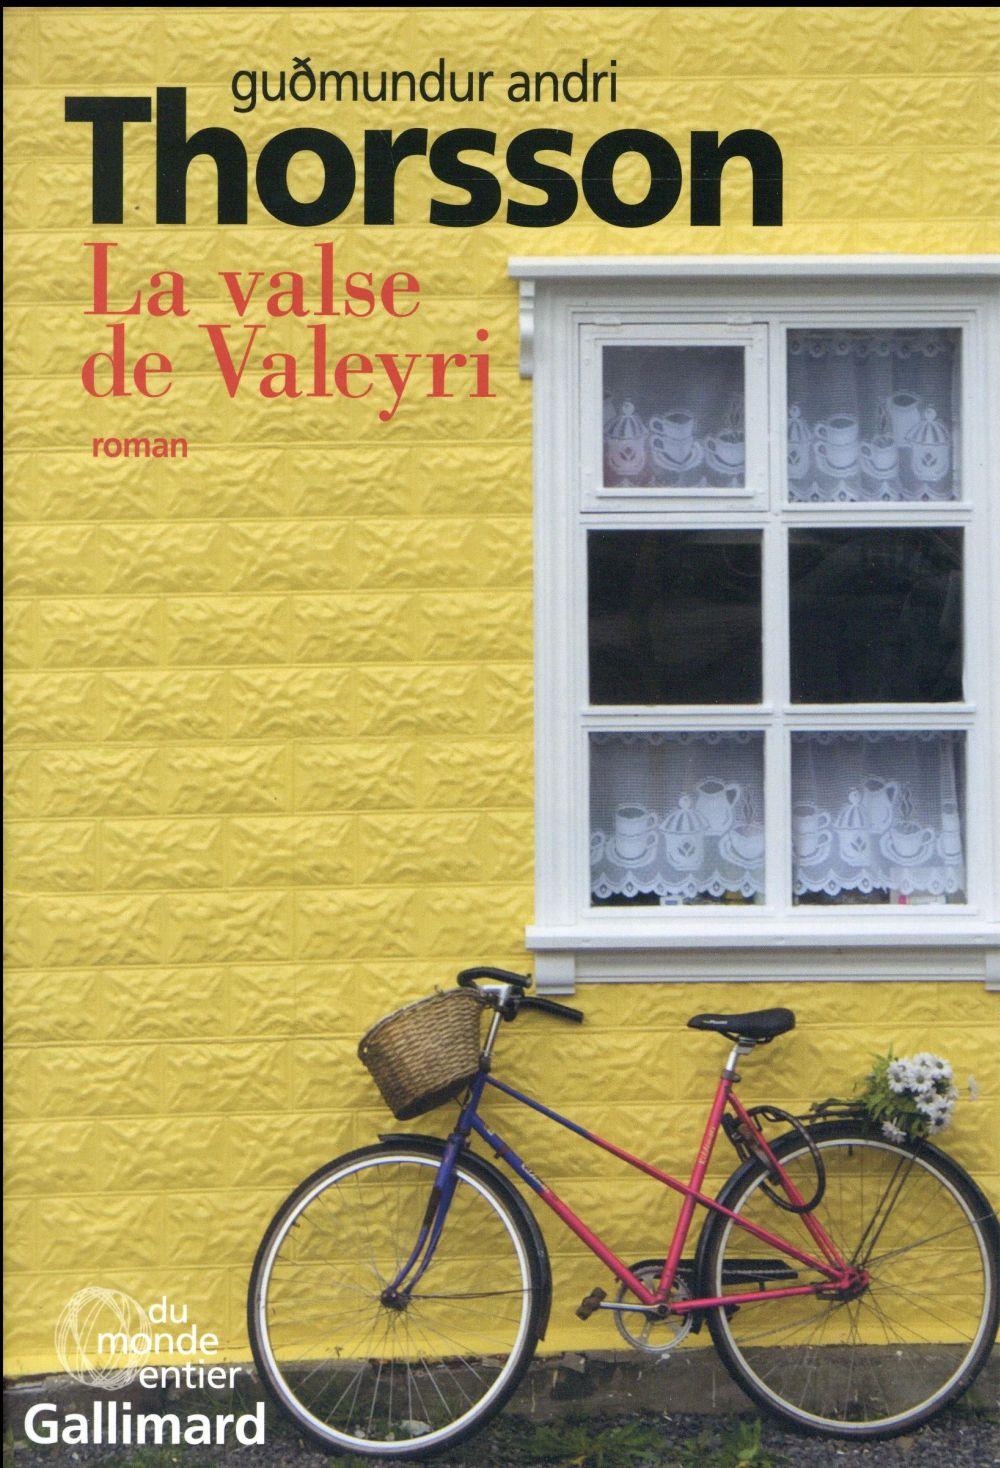 [La ]valse de Valeyri